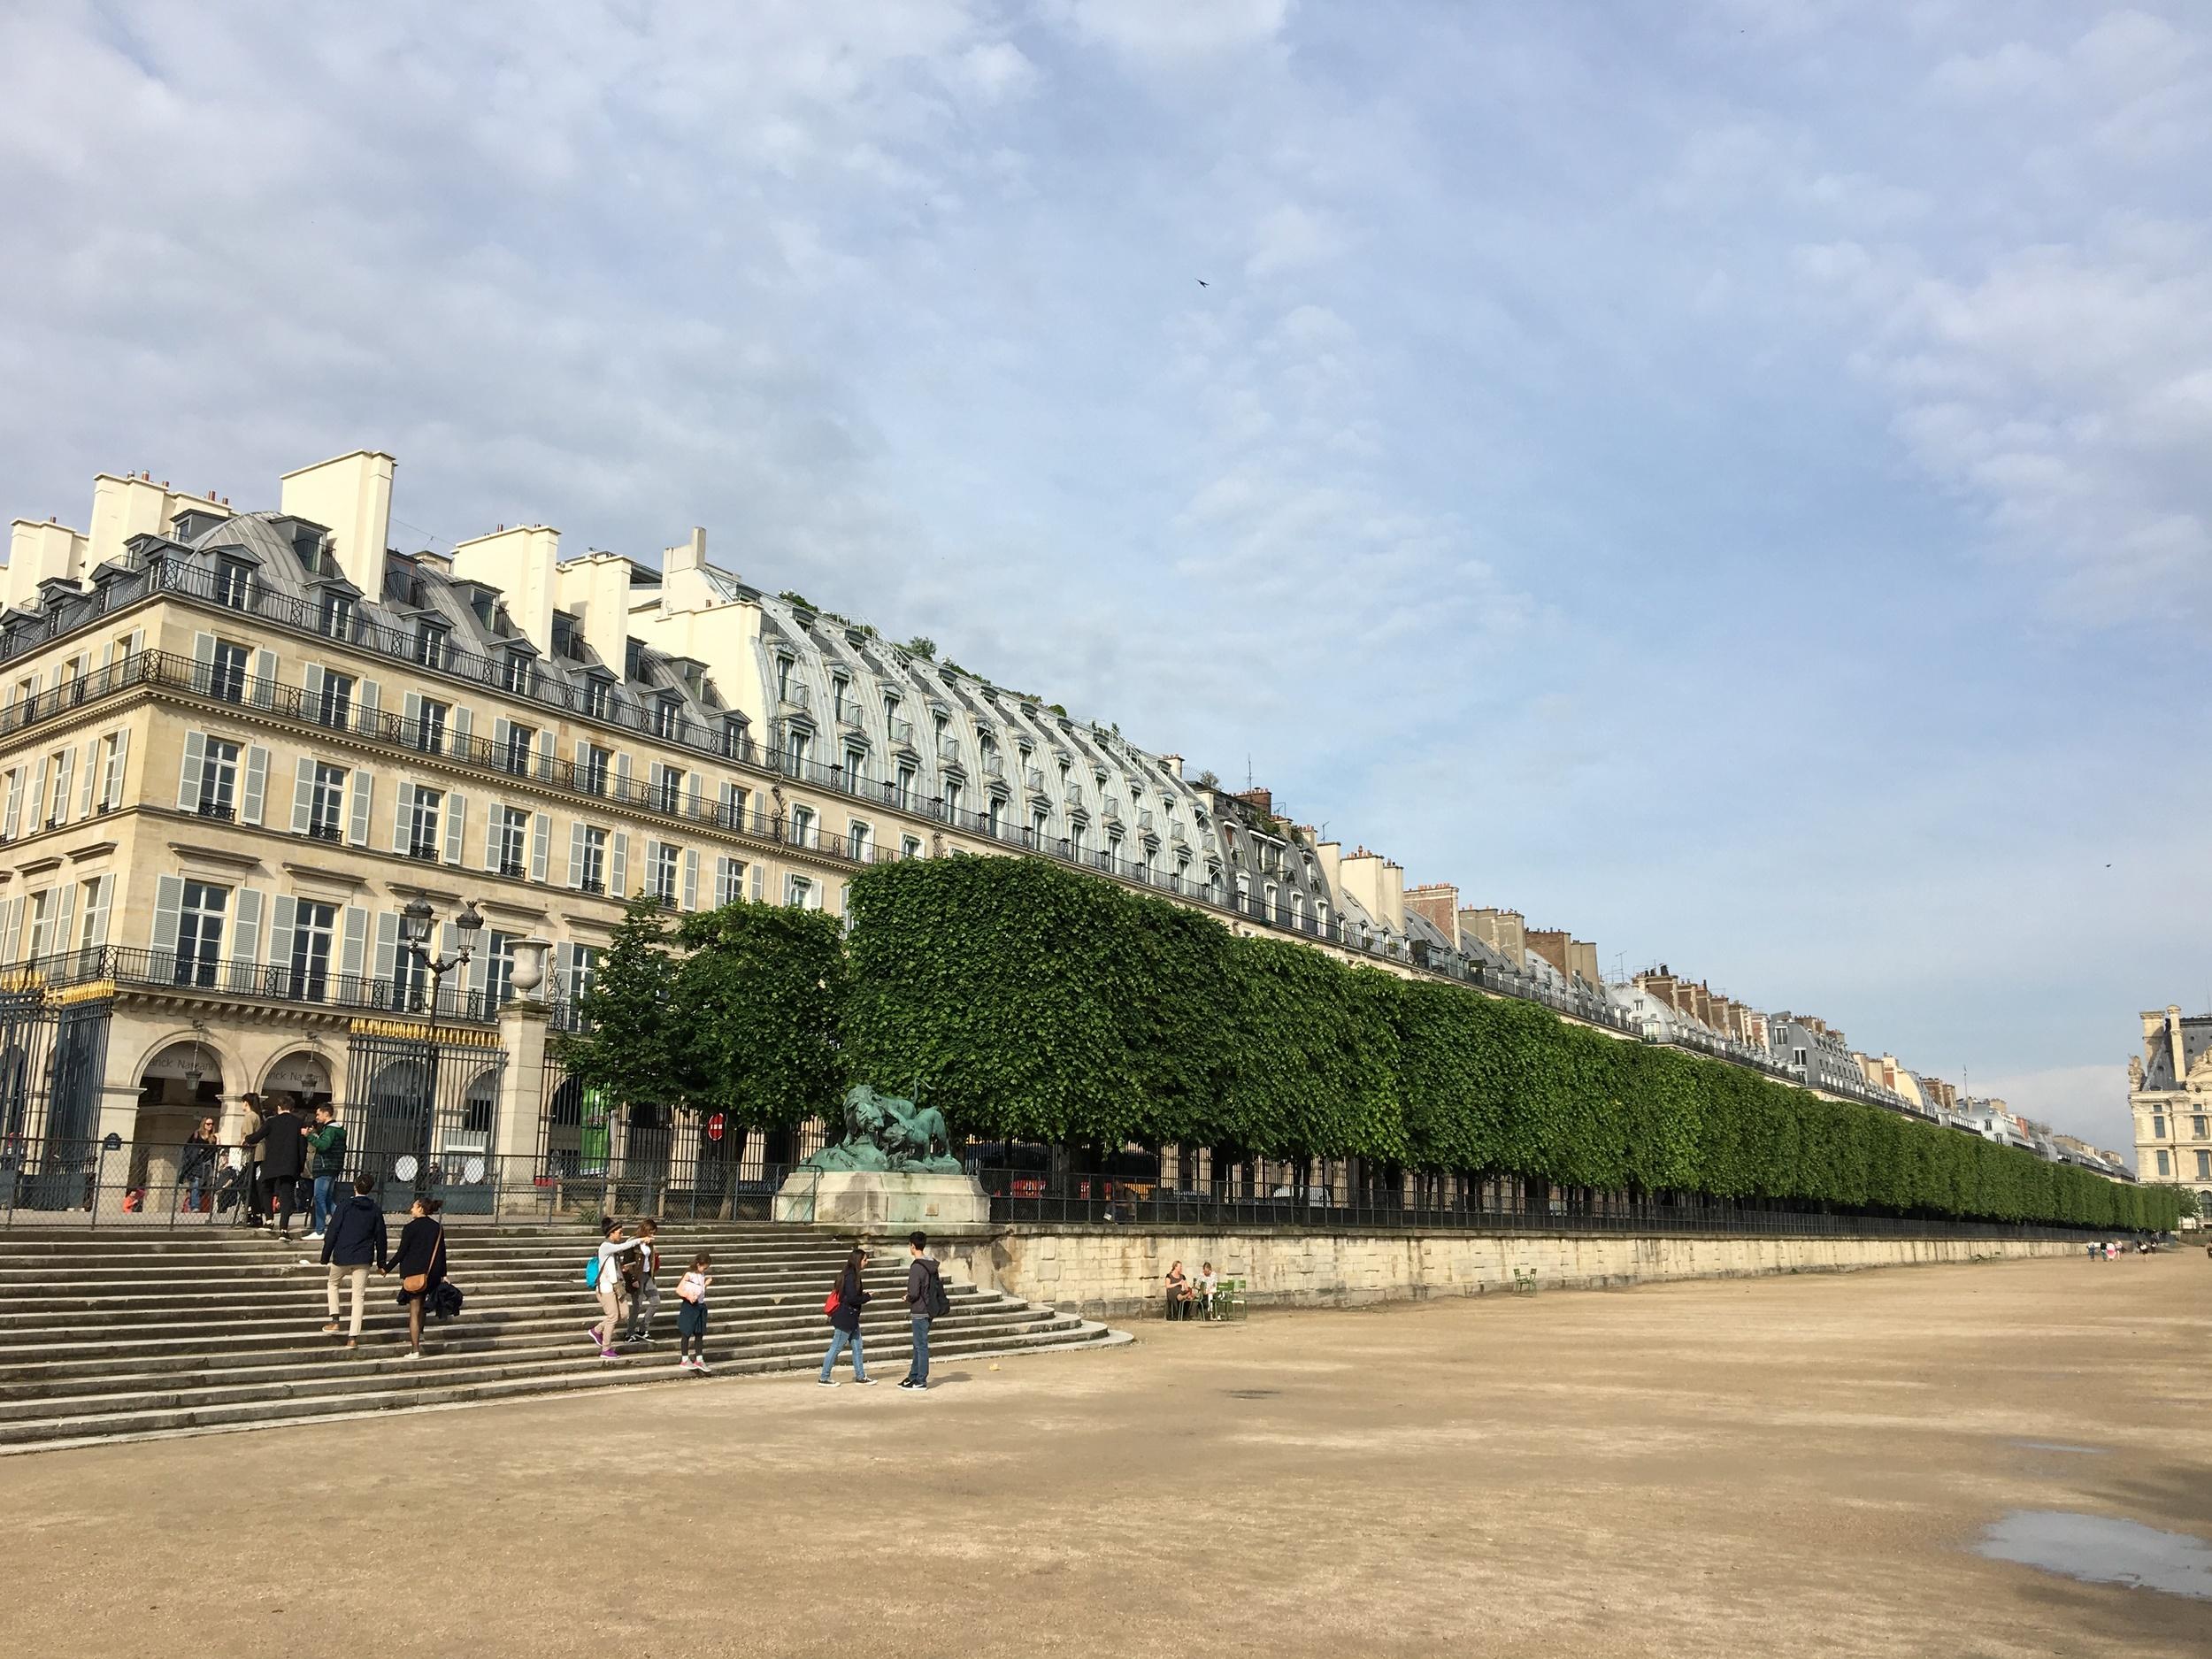 The classic architecture along Rue due Rivoli from Tuileries